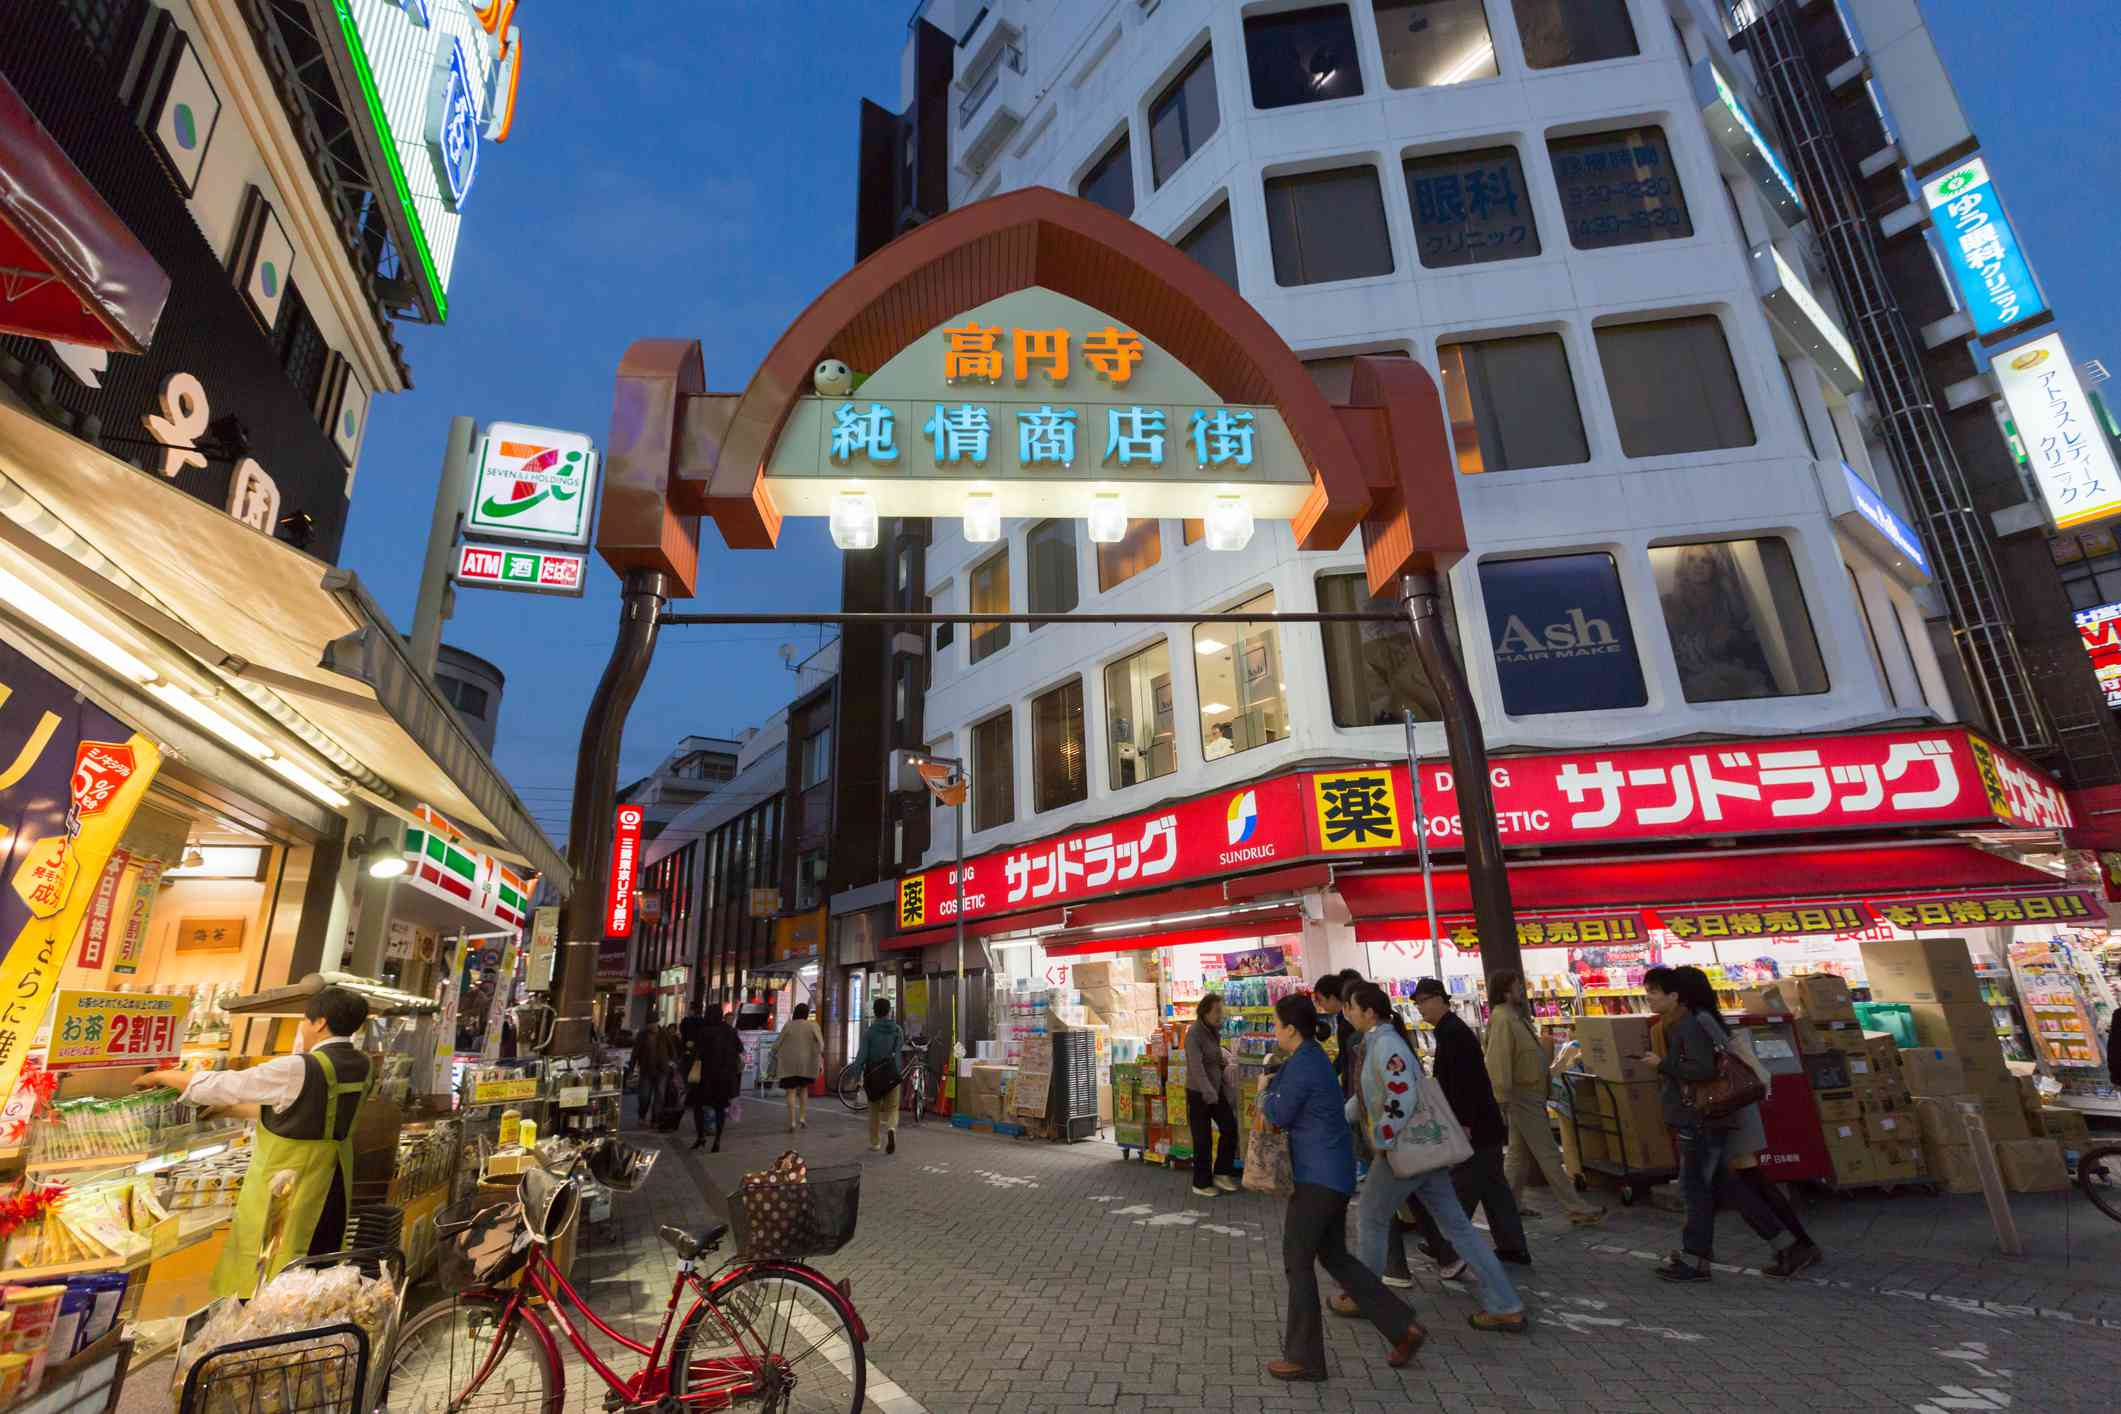 People walk past the Koenji Junjo Shopping Street in Tokyo, Japan.